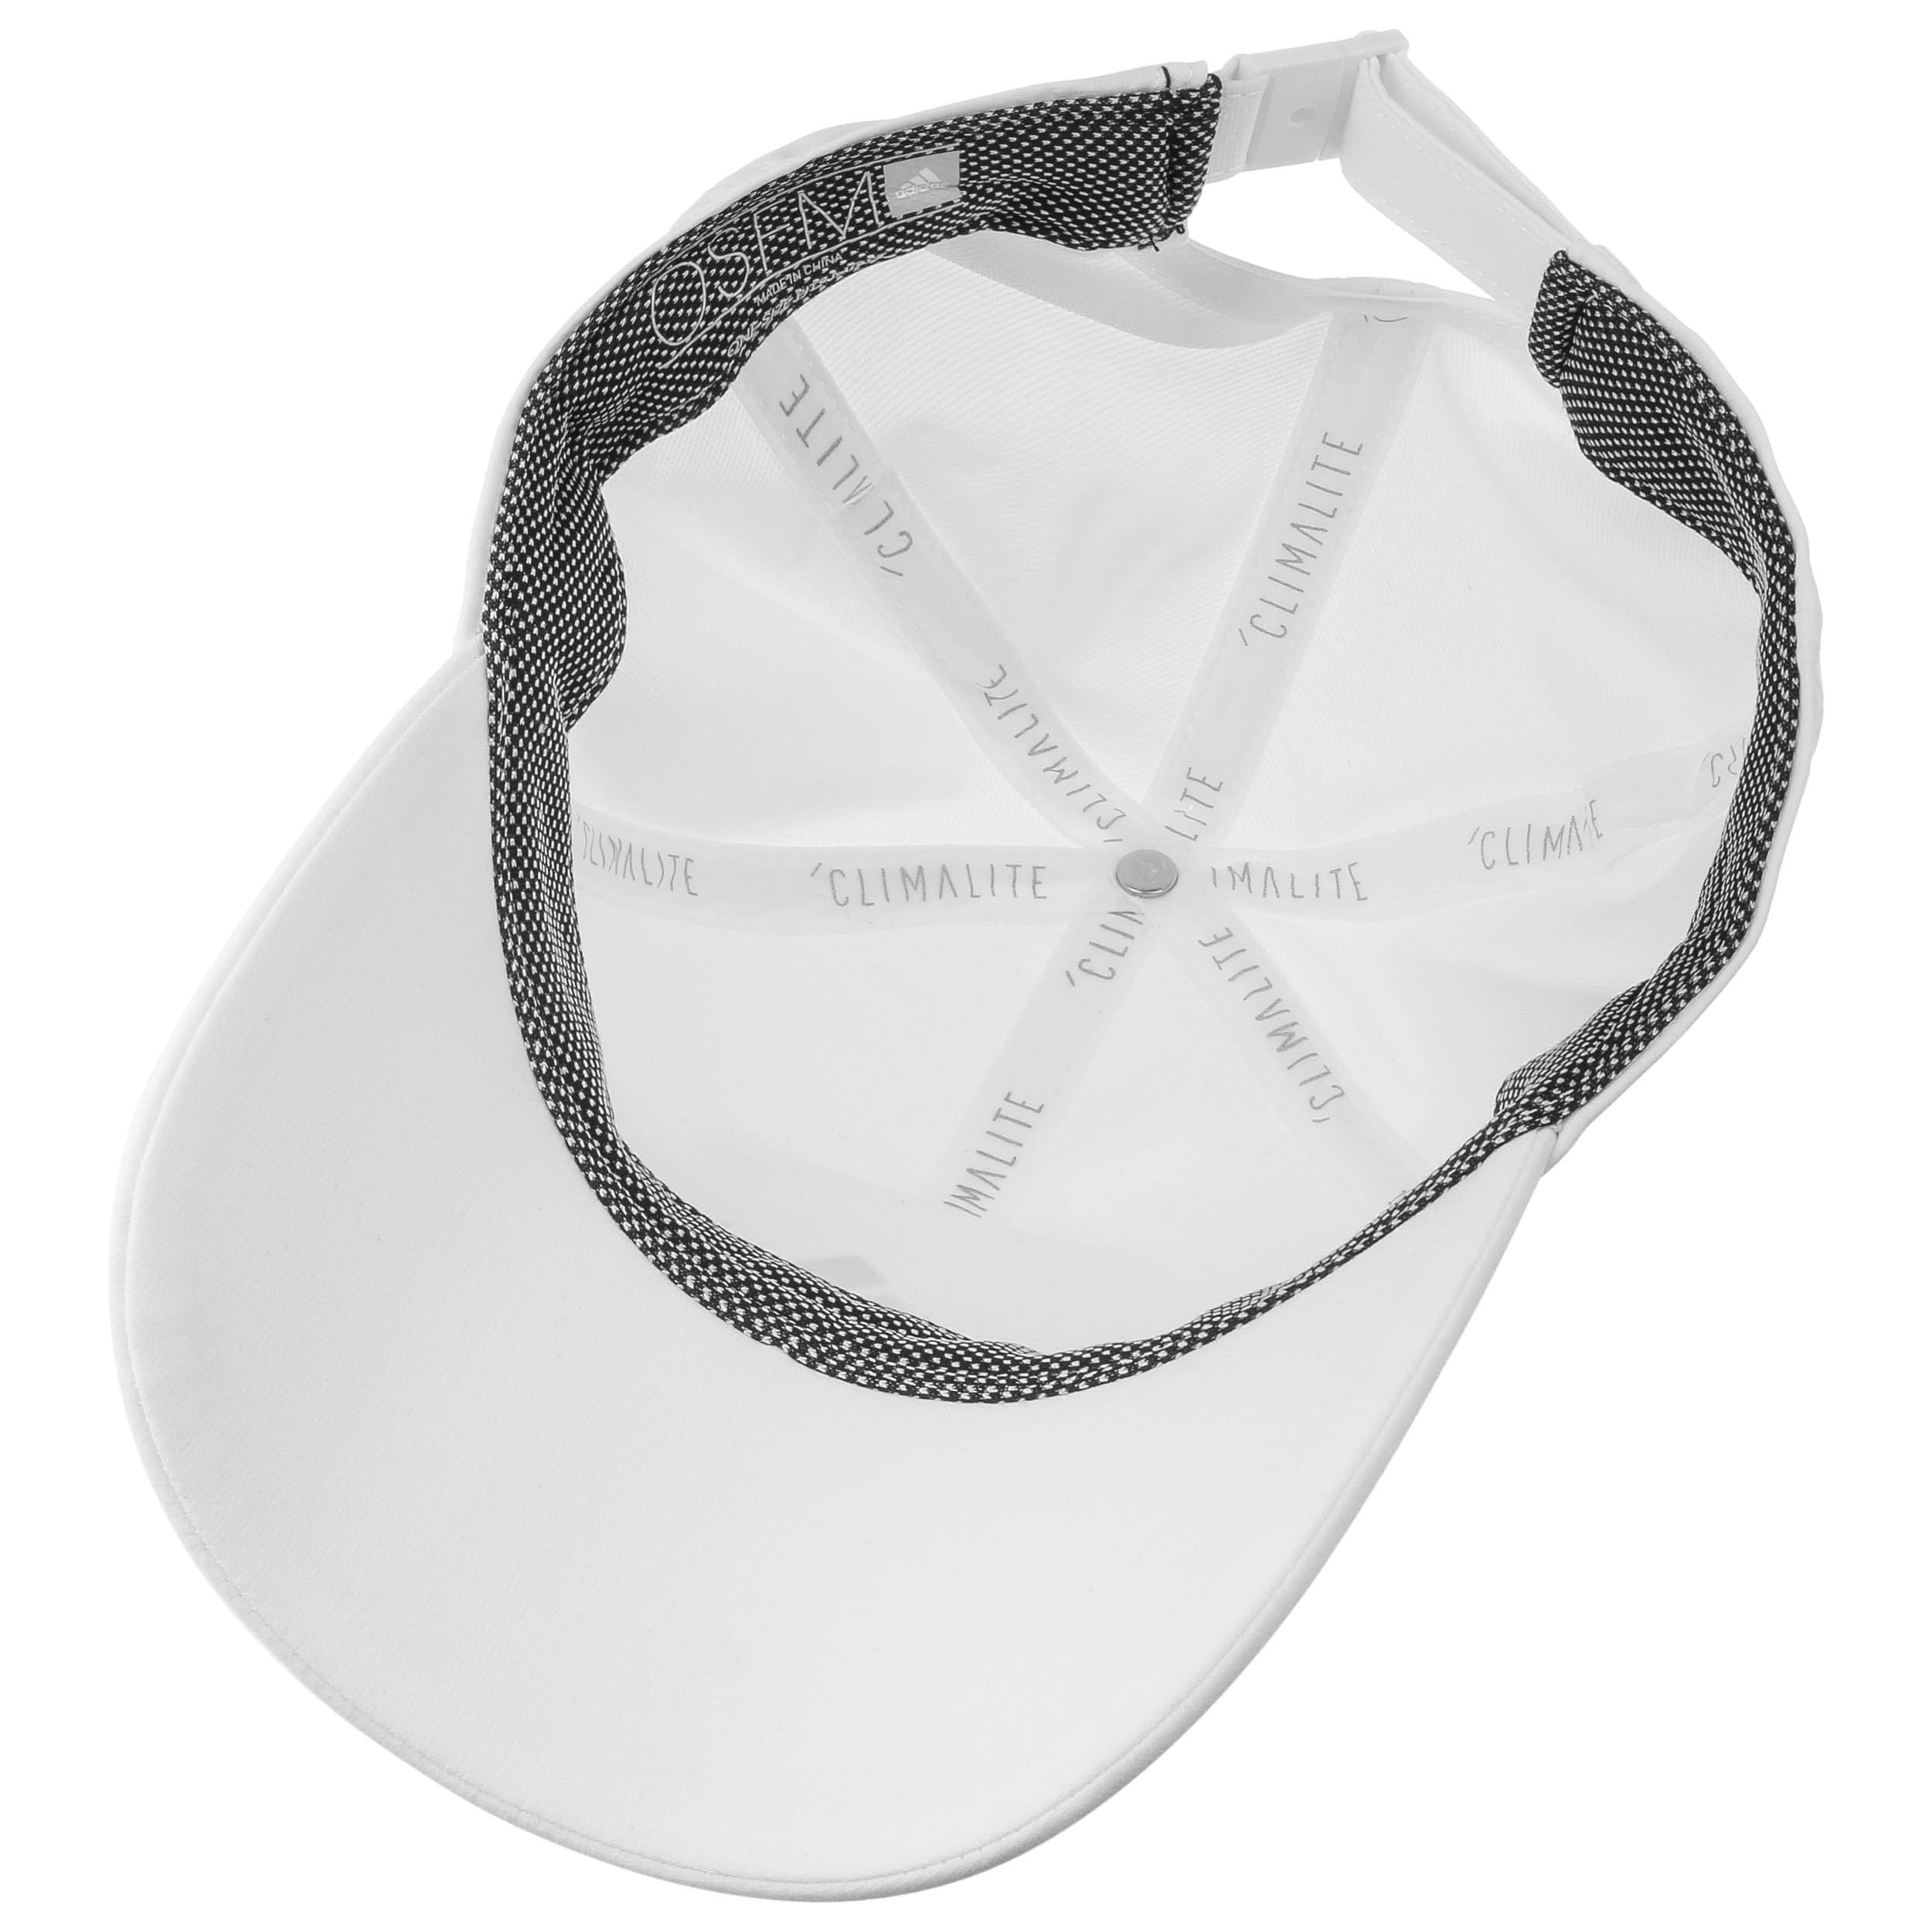 ... black 2 · C40 6P 3S Climalite Cap by adidas - white 2 ... cad215015d6